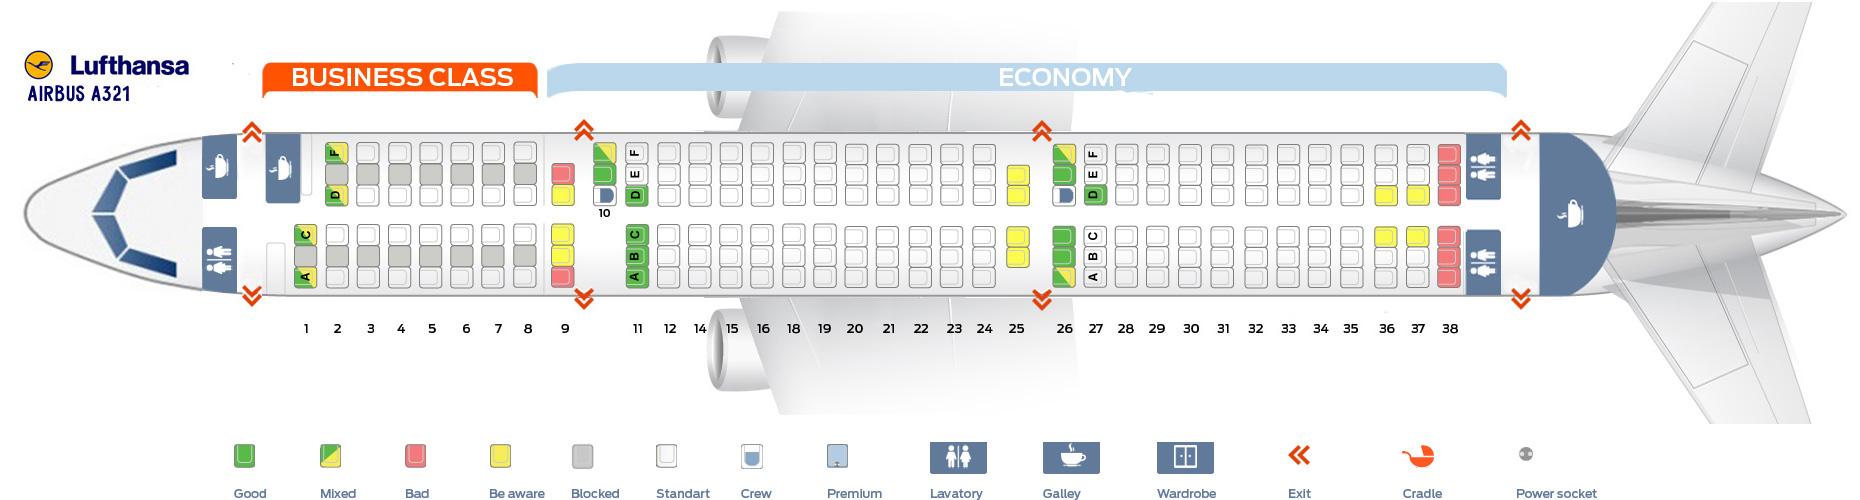 Seat_map_Lufthansa_Airbus_A321